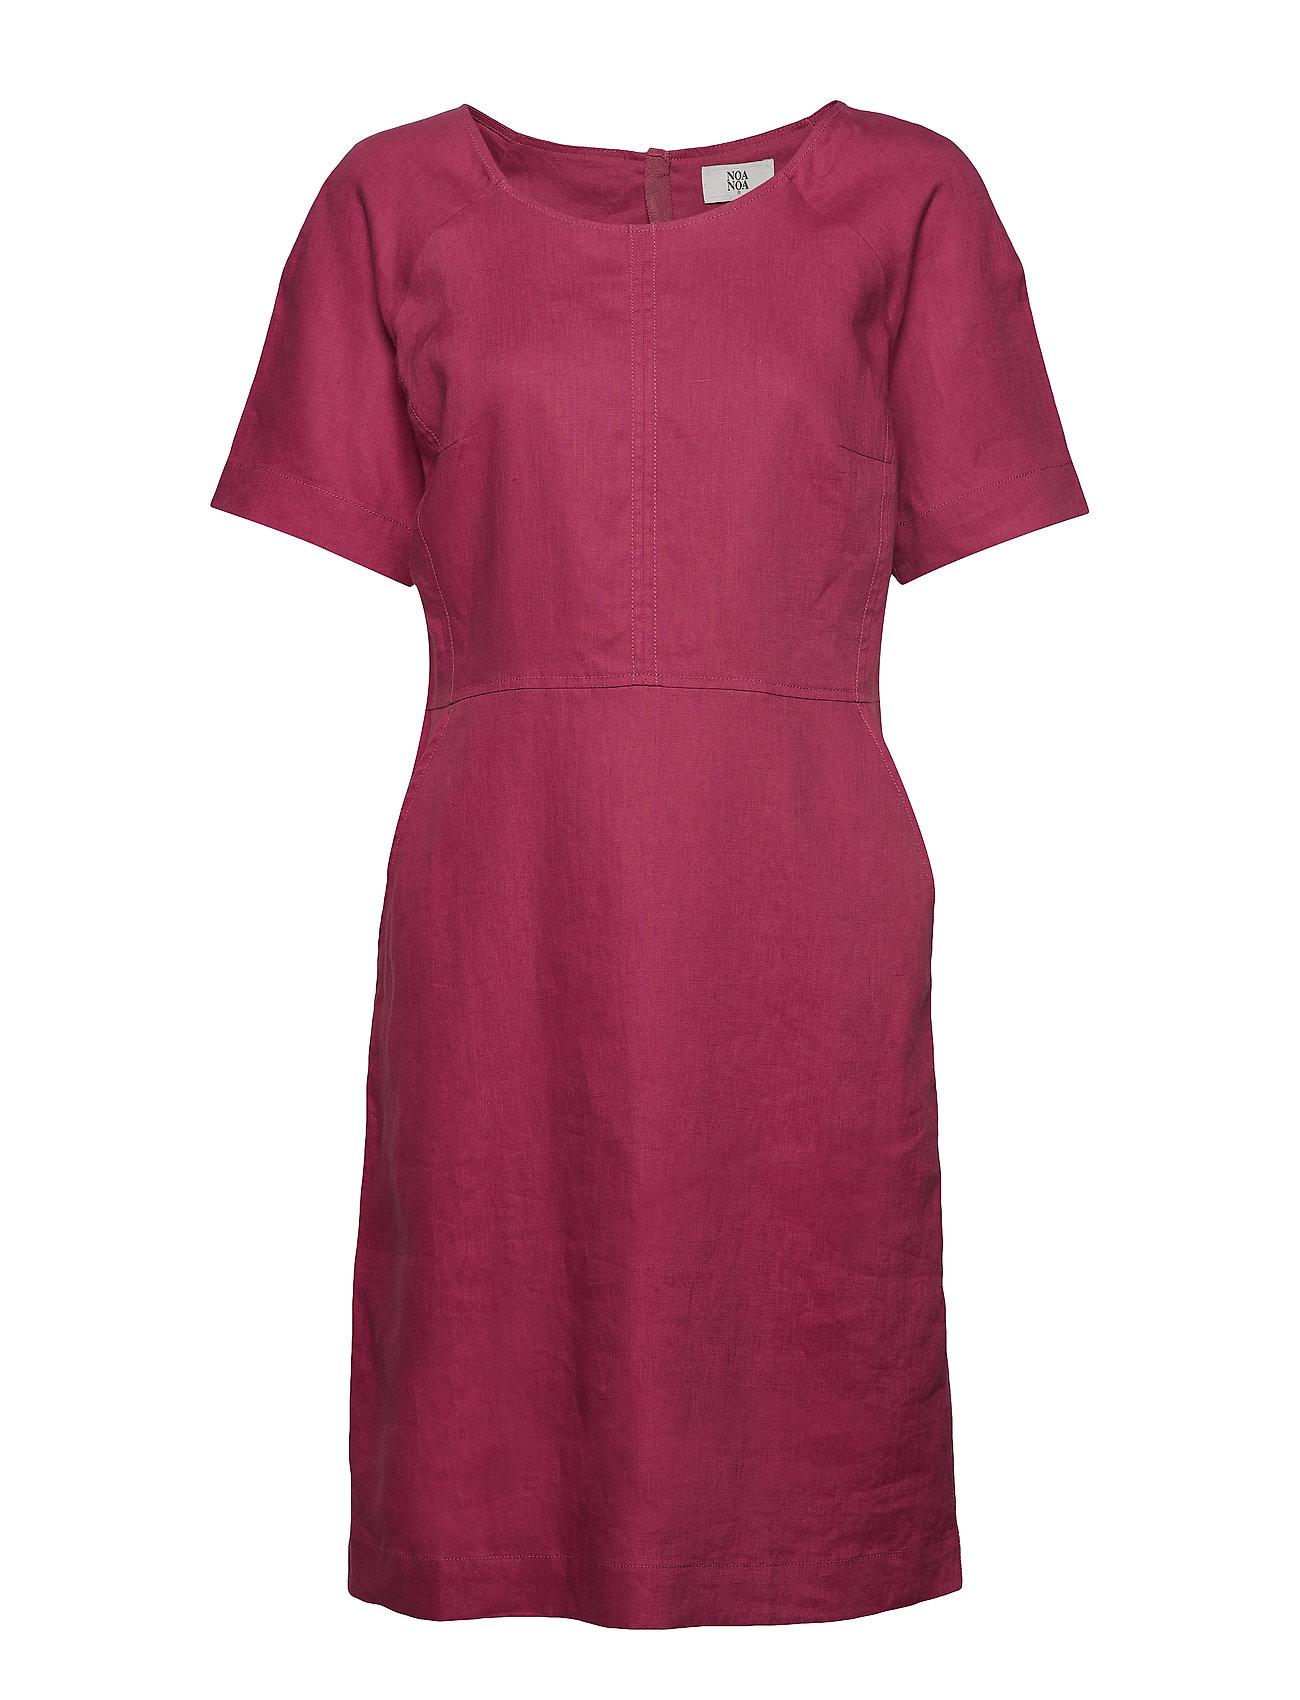 VioletNoa Dress Short Sleevered Short Sleevered Dress Short VioletNoa Sleevered Dress wZuiXPlkOT